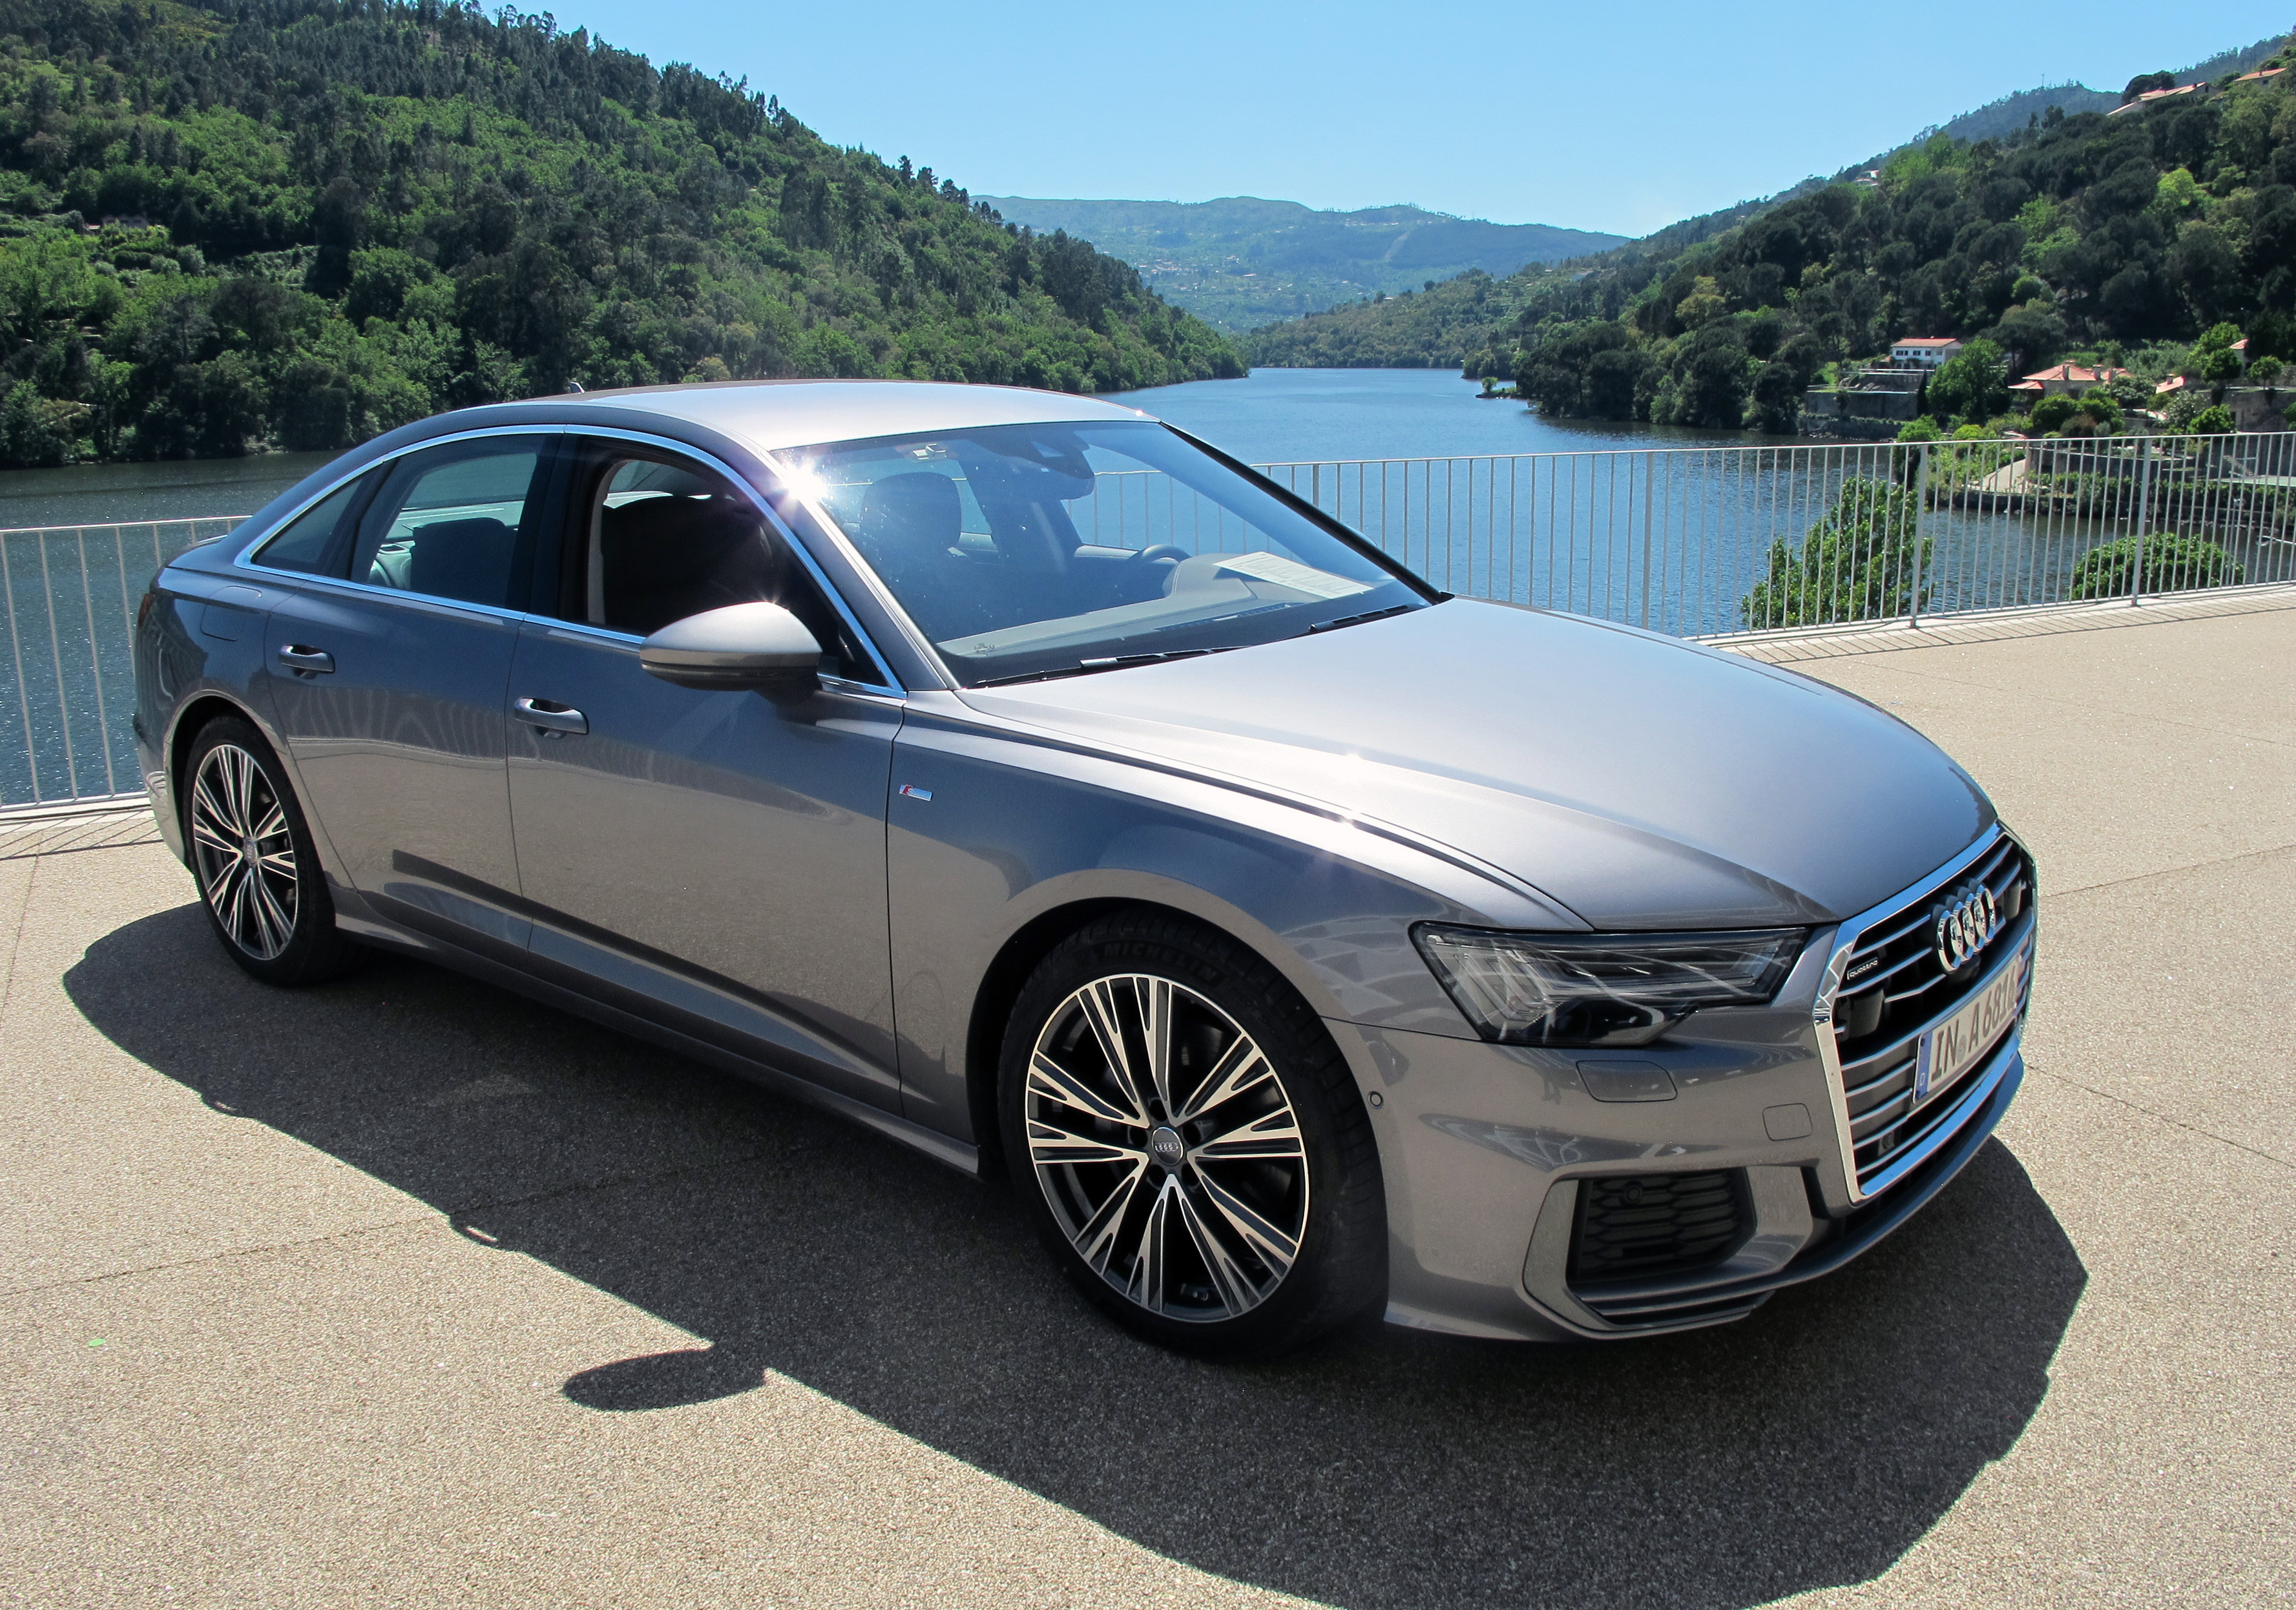 Kelebihan A6 Audi 2019 Murah Berkualitas